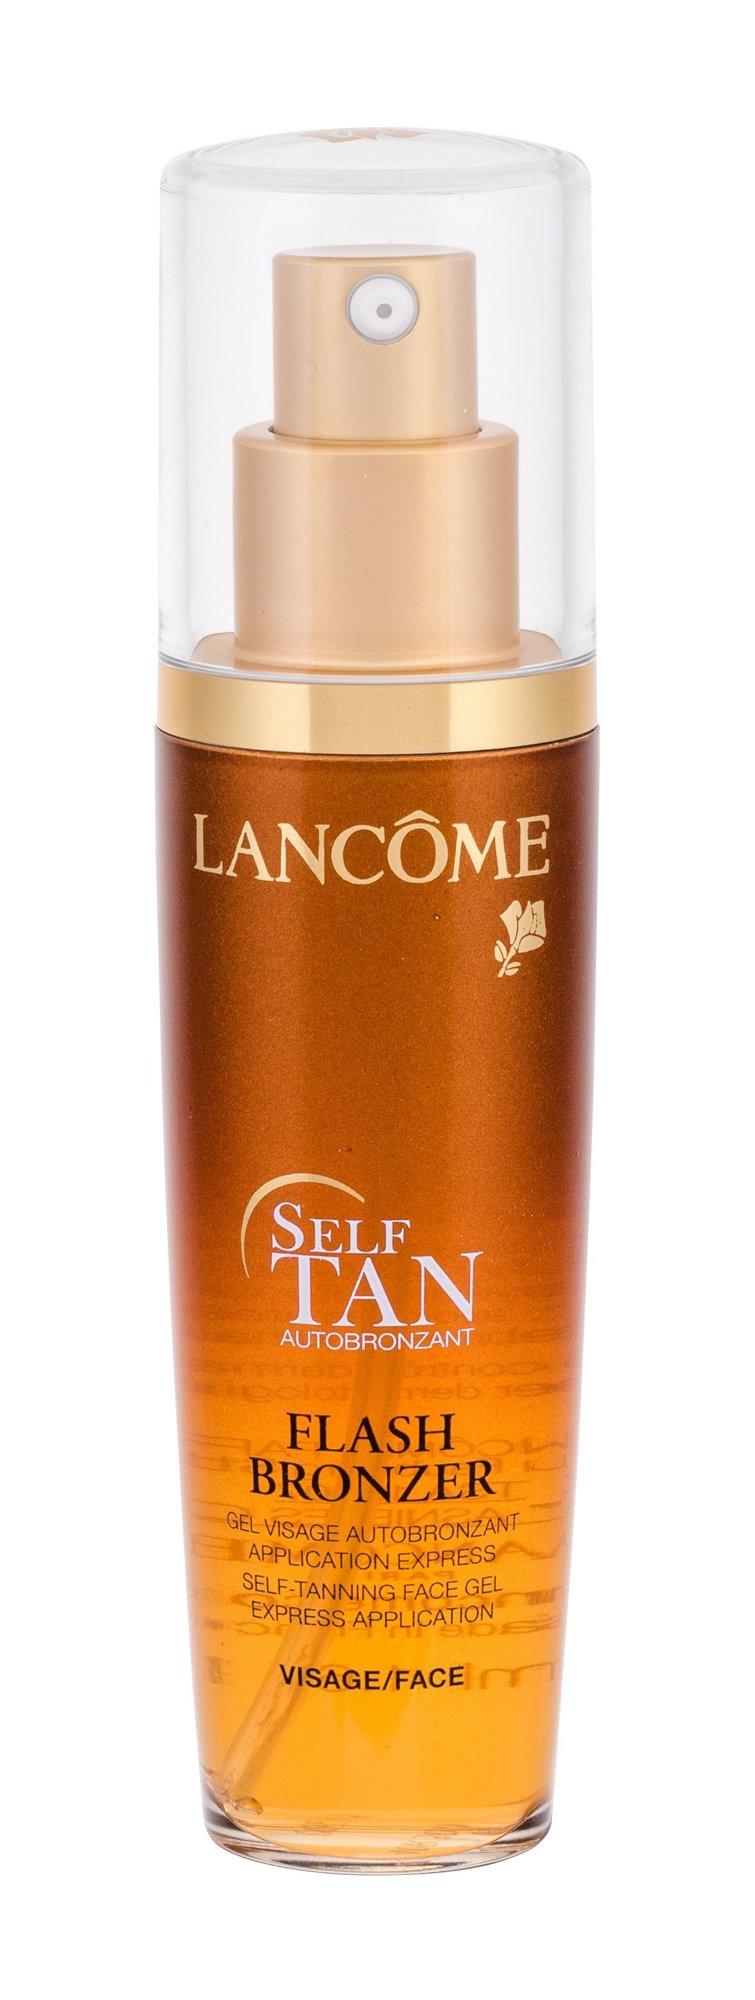 Lancôme Flash Bronzer Self Tanning Product 50ml